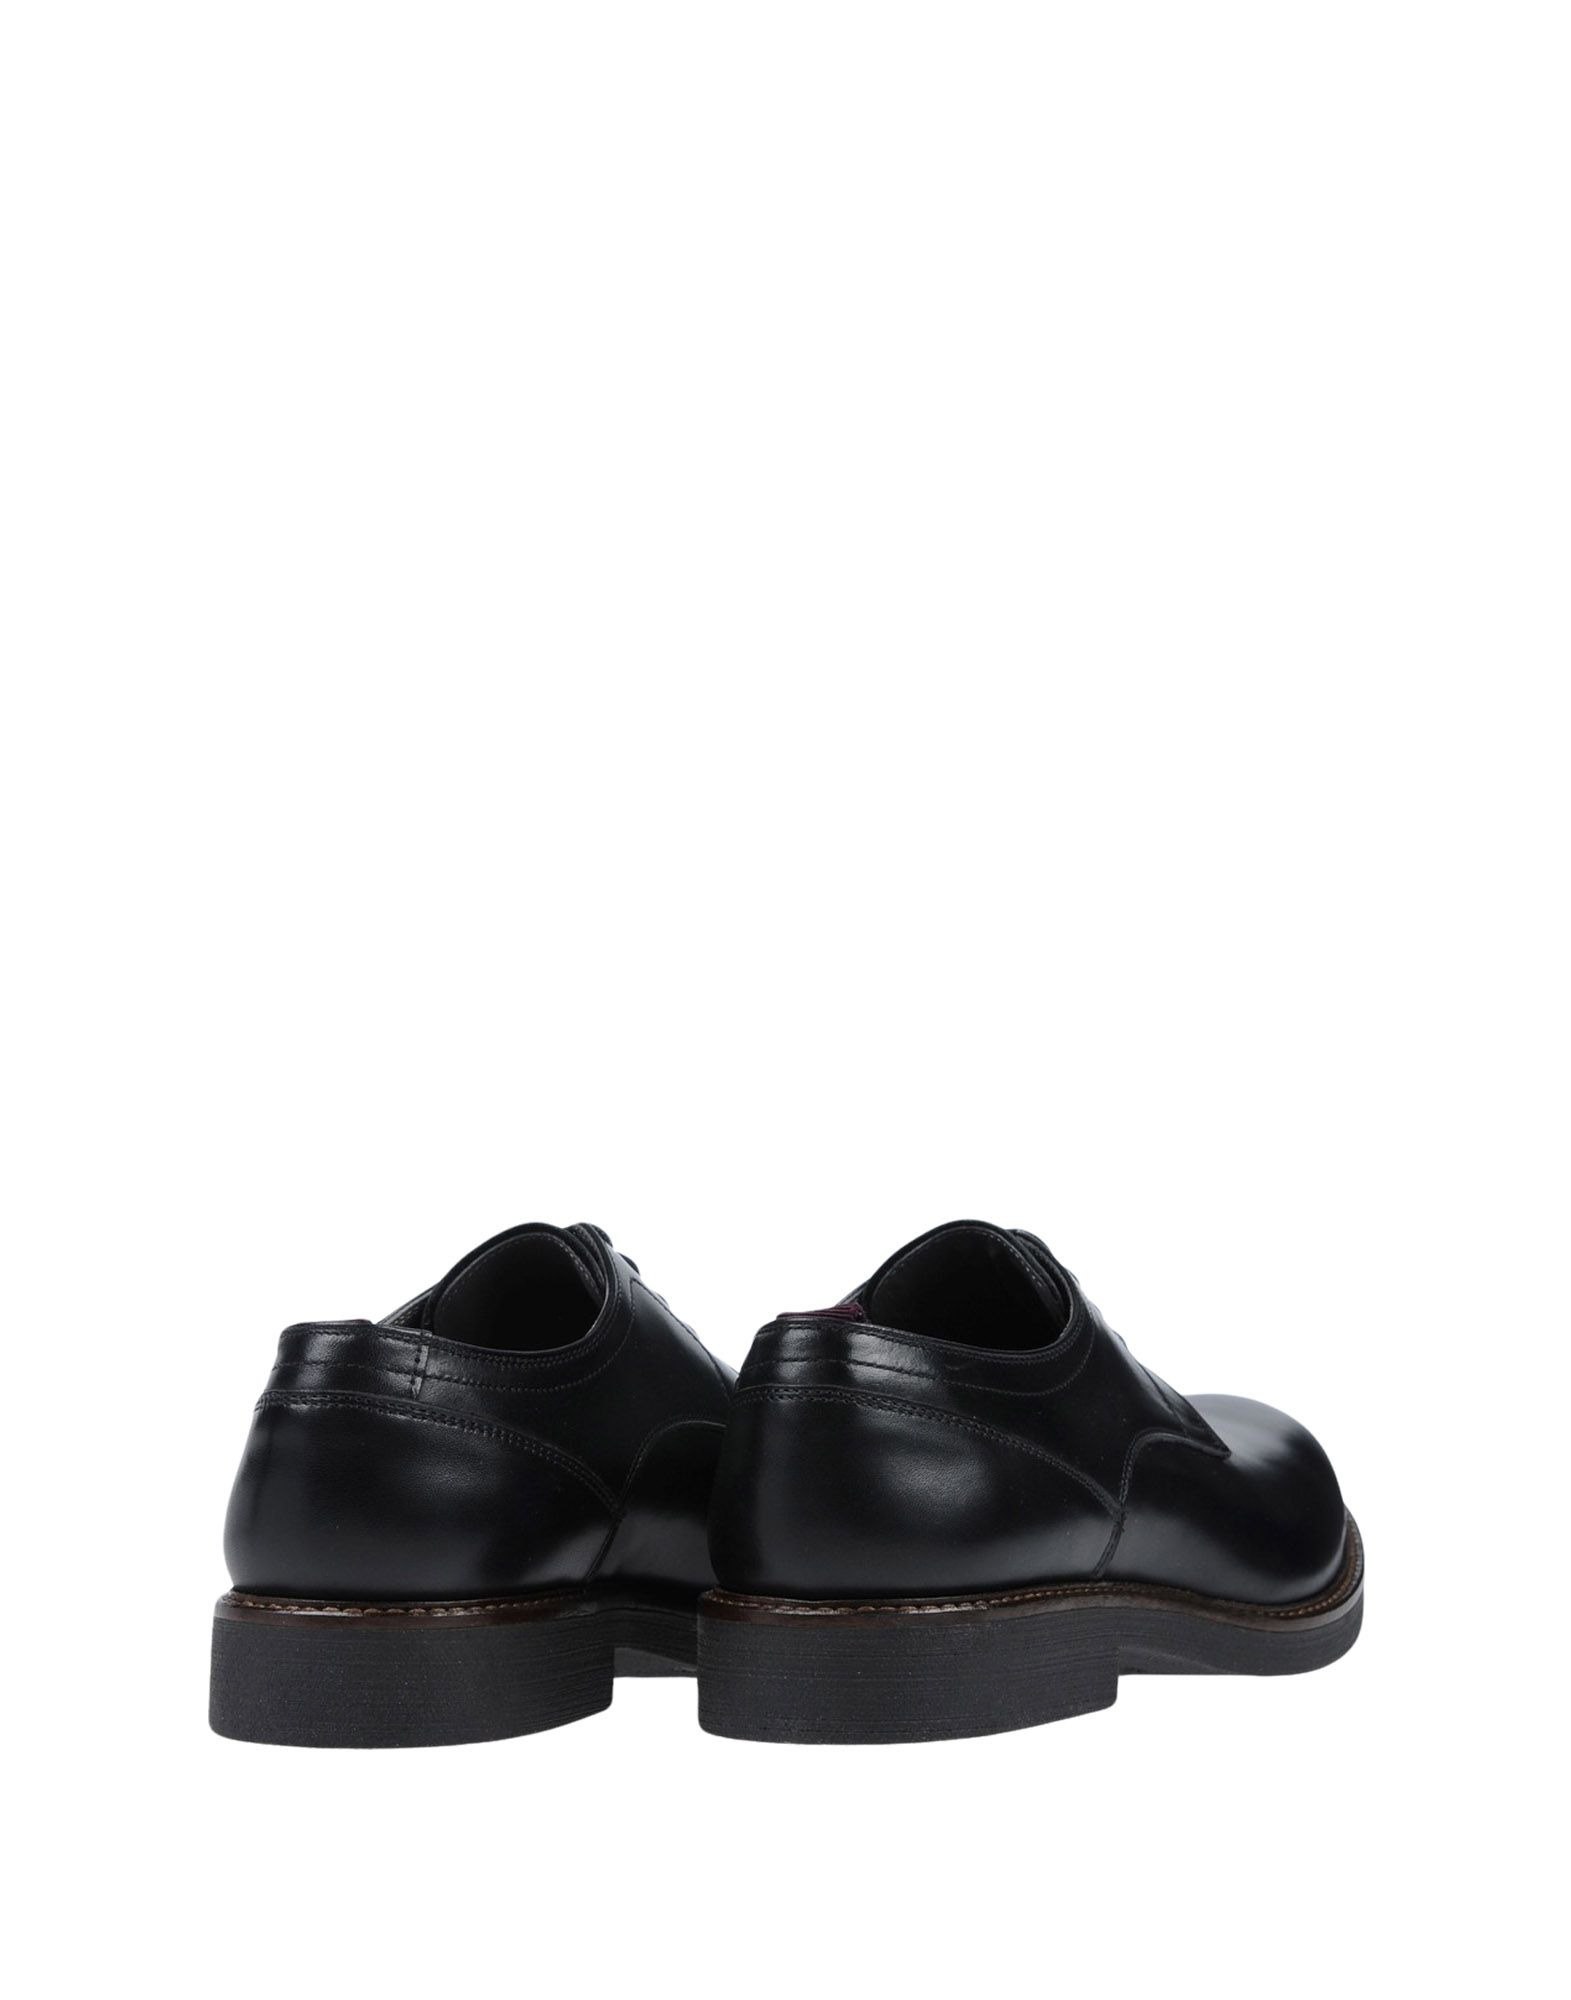 Pollini Schnürschuhe Herren  11447419CA Schuhe Gute Qualität beliebte Schuhe 11447419CA c122ce